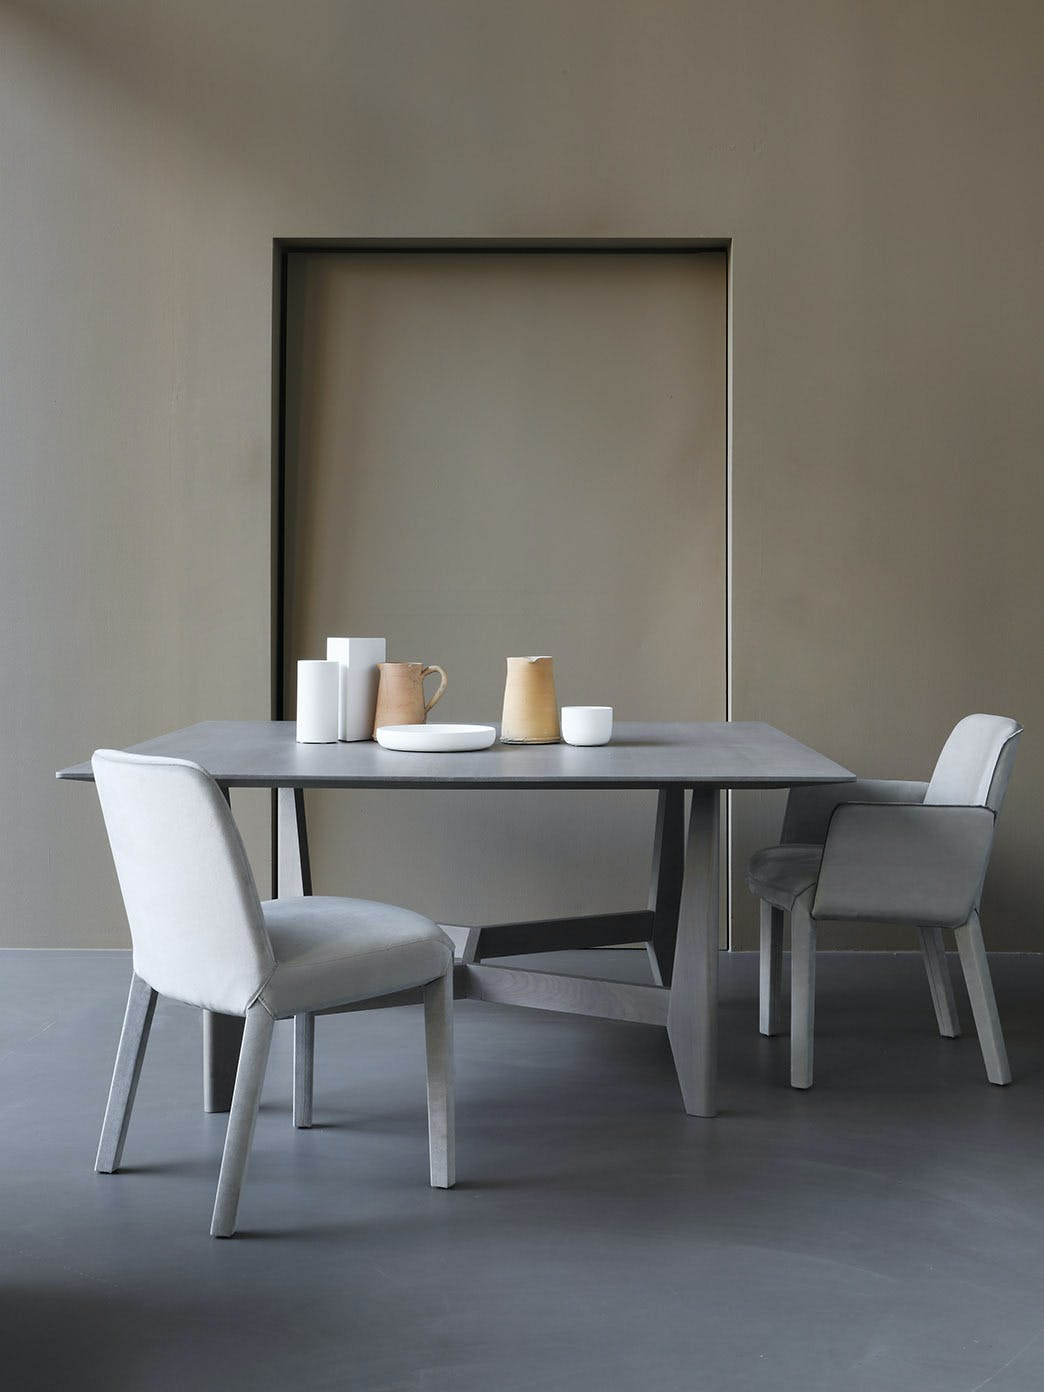 Product Design Dining Milan Furniture Fair Yke Table Minne Chair Ec 019 Tall